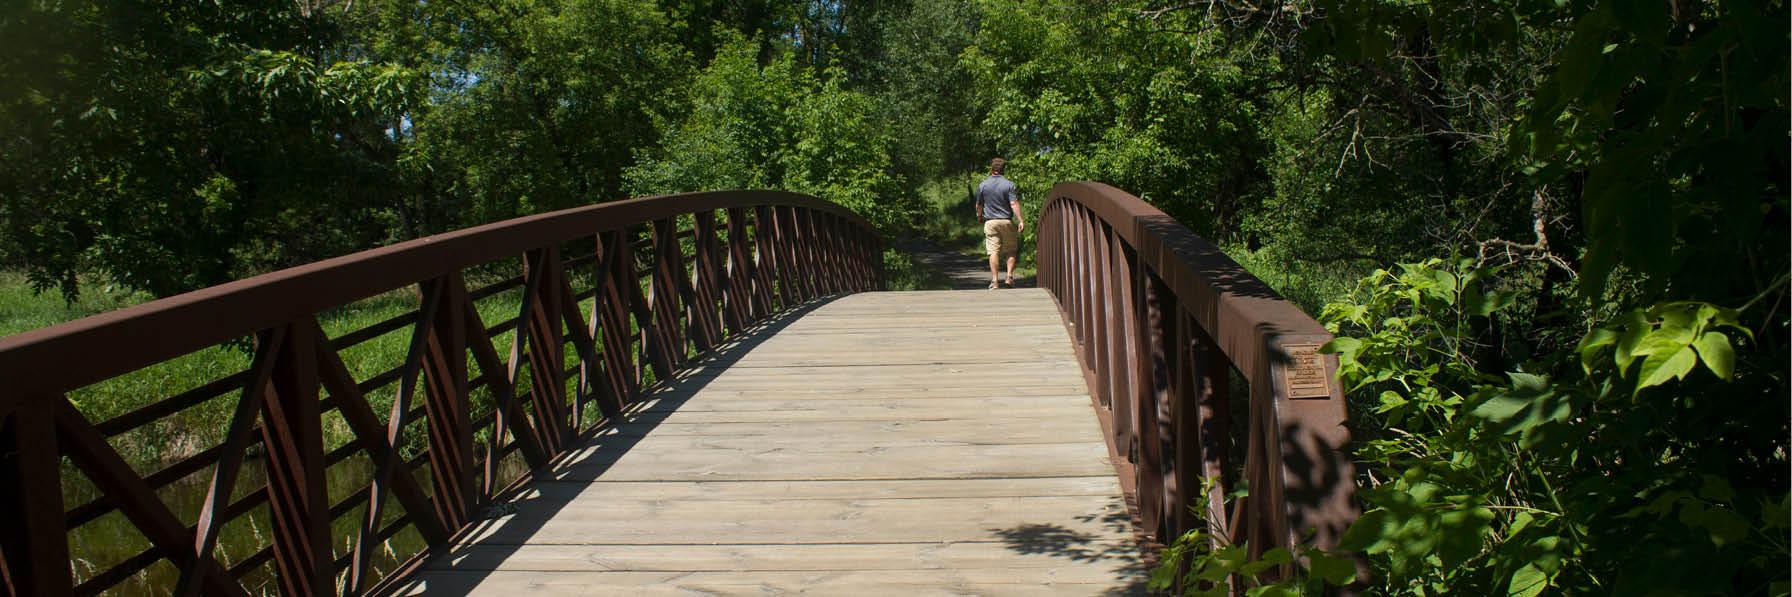 Ramsey County Trail